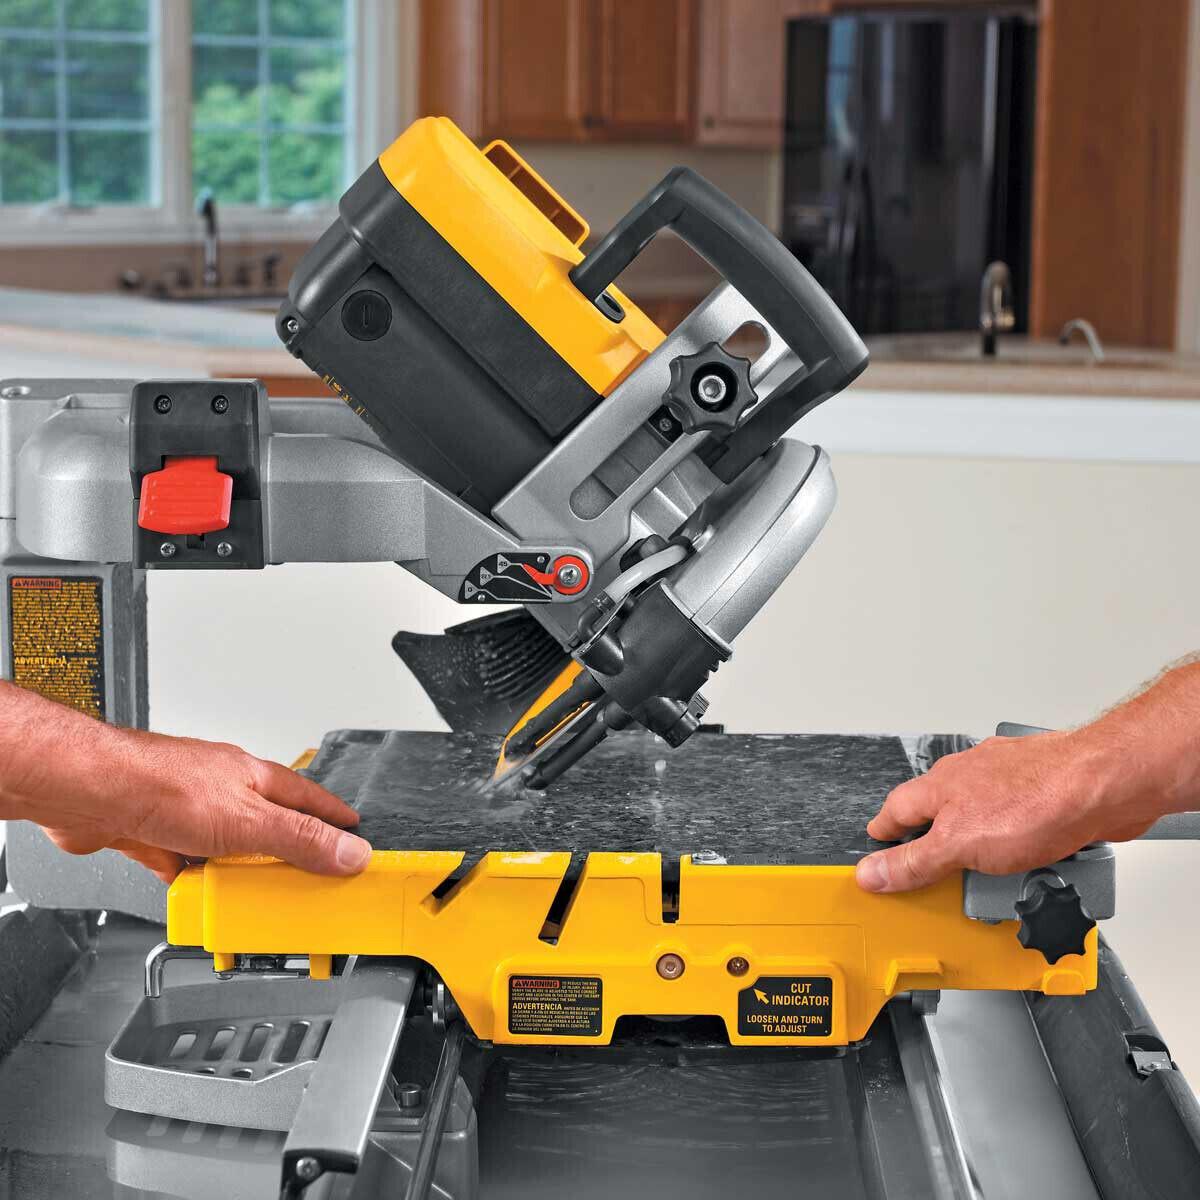 D24000 Tile Saw 45 degree miter cut